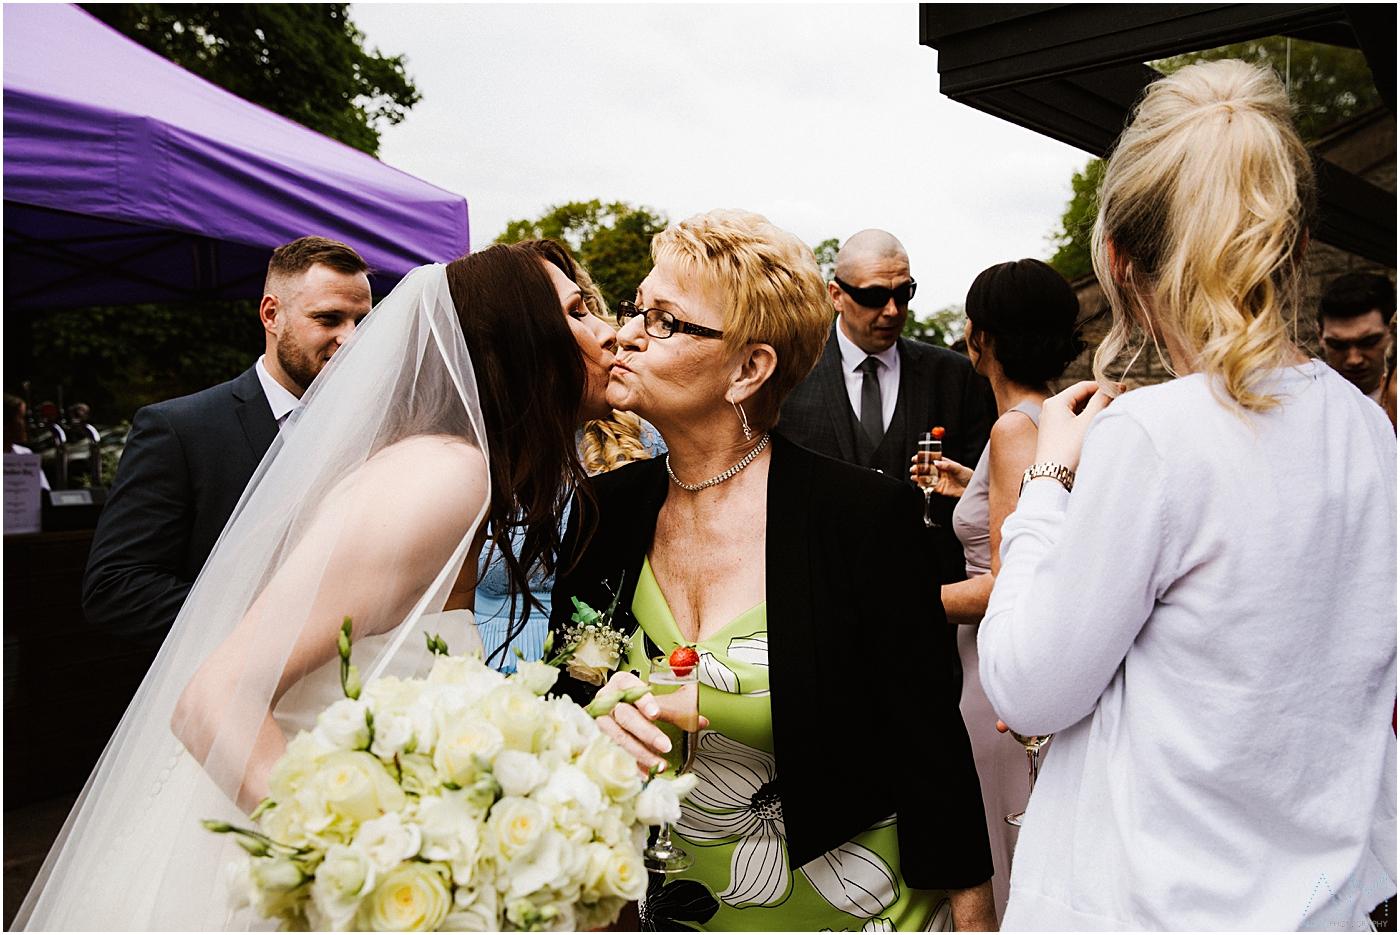 wedding guest kisses the bride